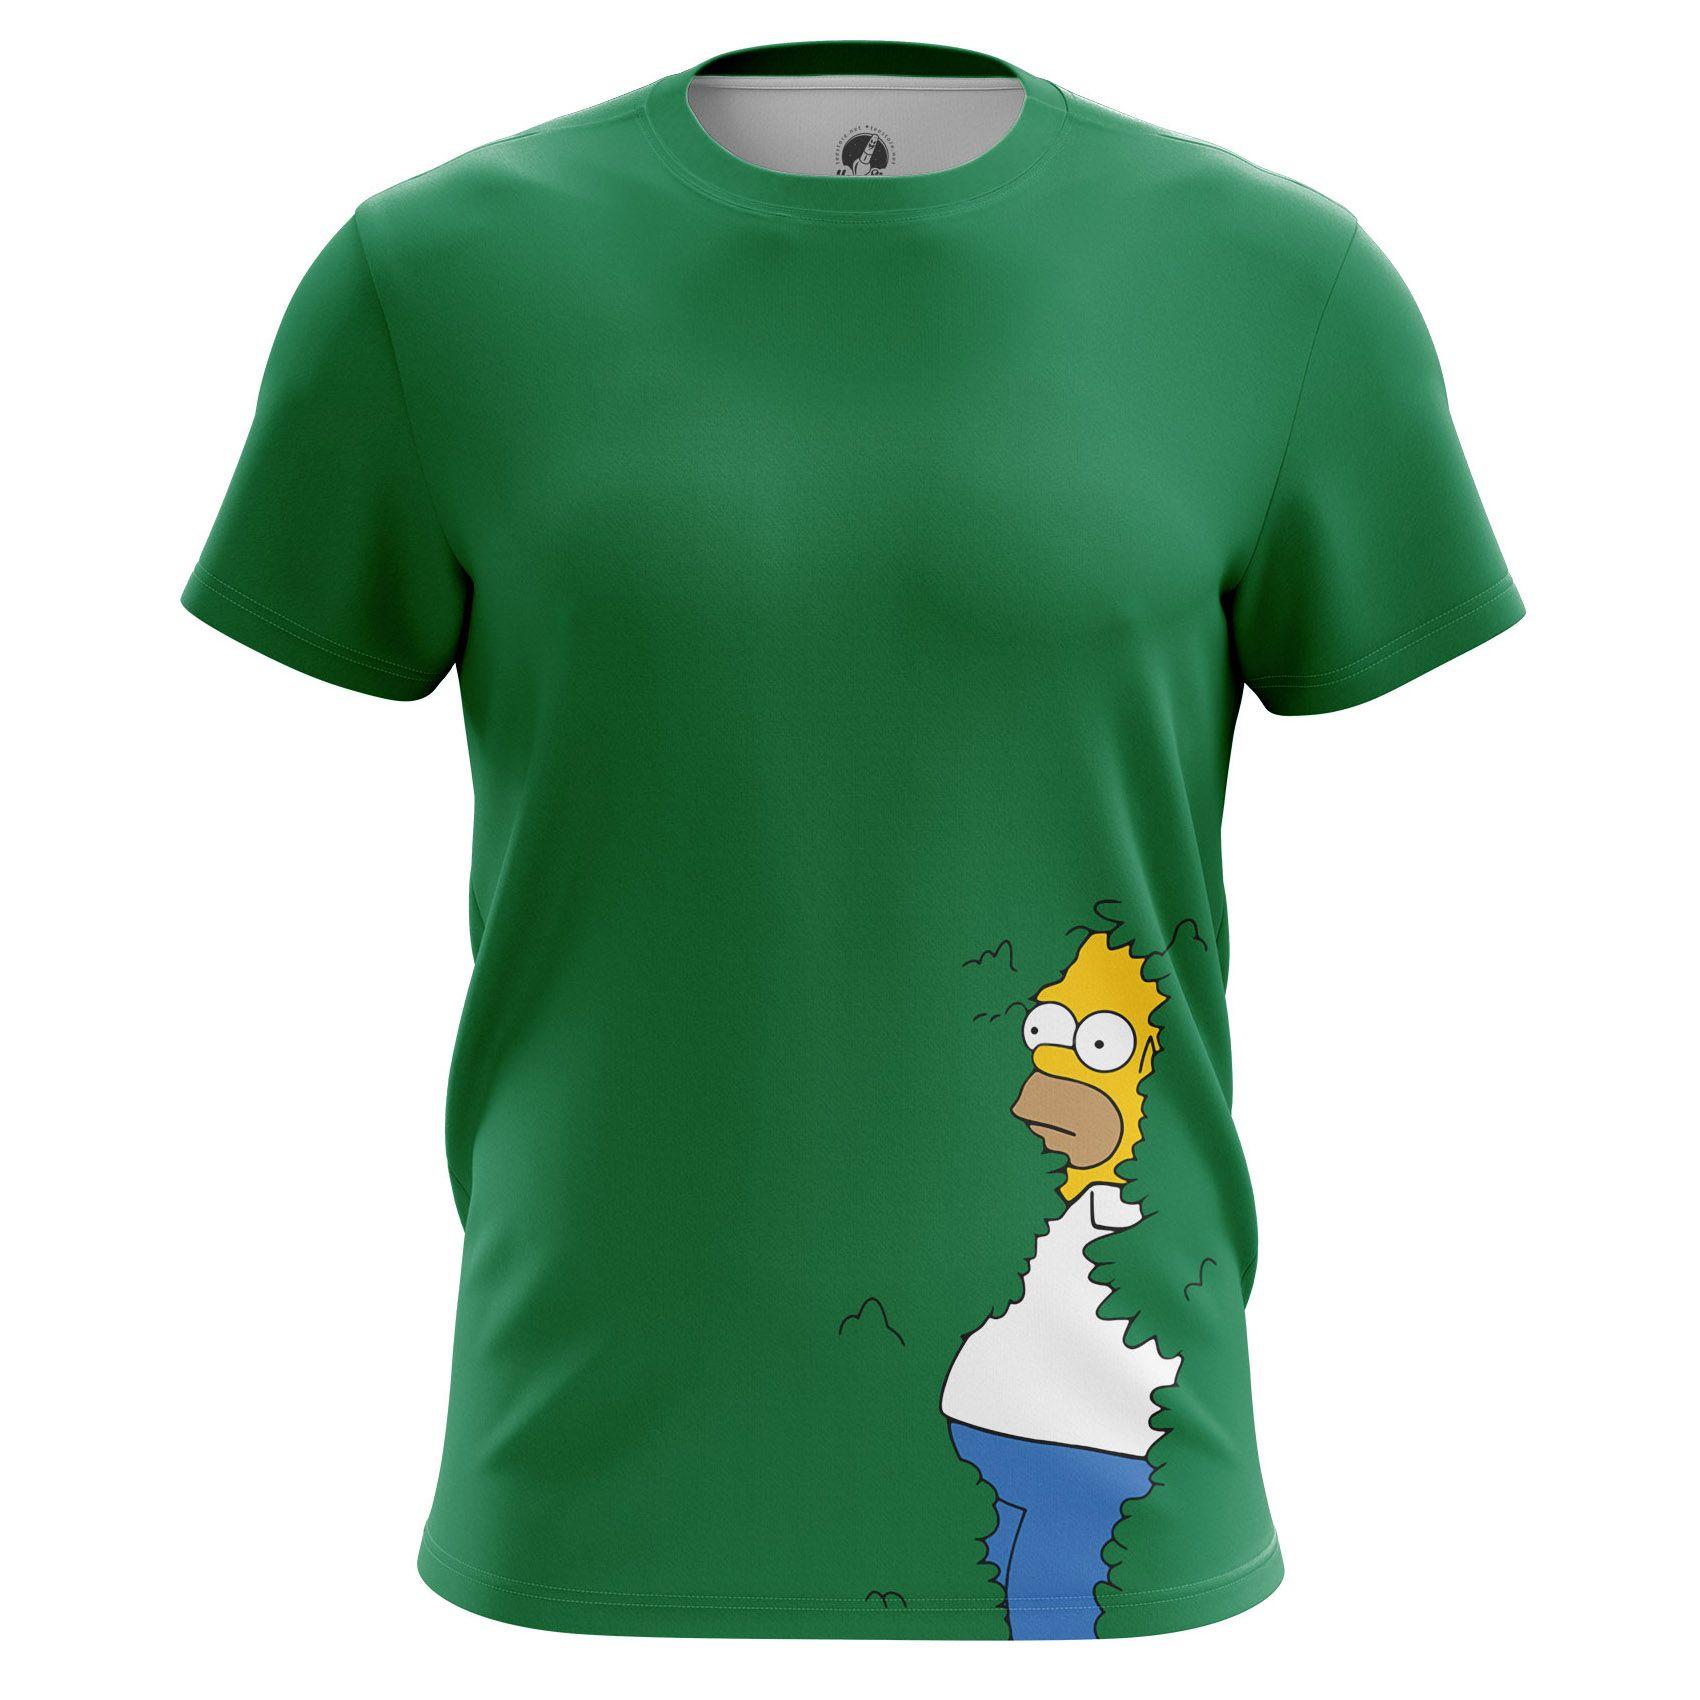 d7b80e5e7 awesome Boys T-Shirt Homer Simpson Cartoons The Simpsons Bushes Art -   Animatedcartoonsmerch  boysclothes  boystshirt   cartoonsclothestheSimpsonstshirt ...